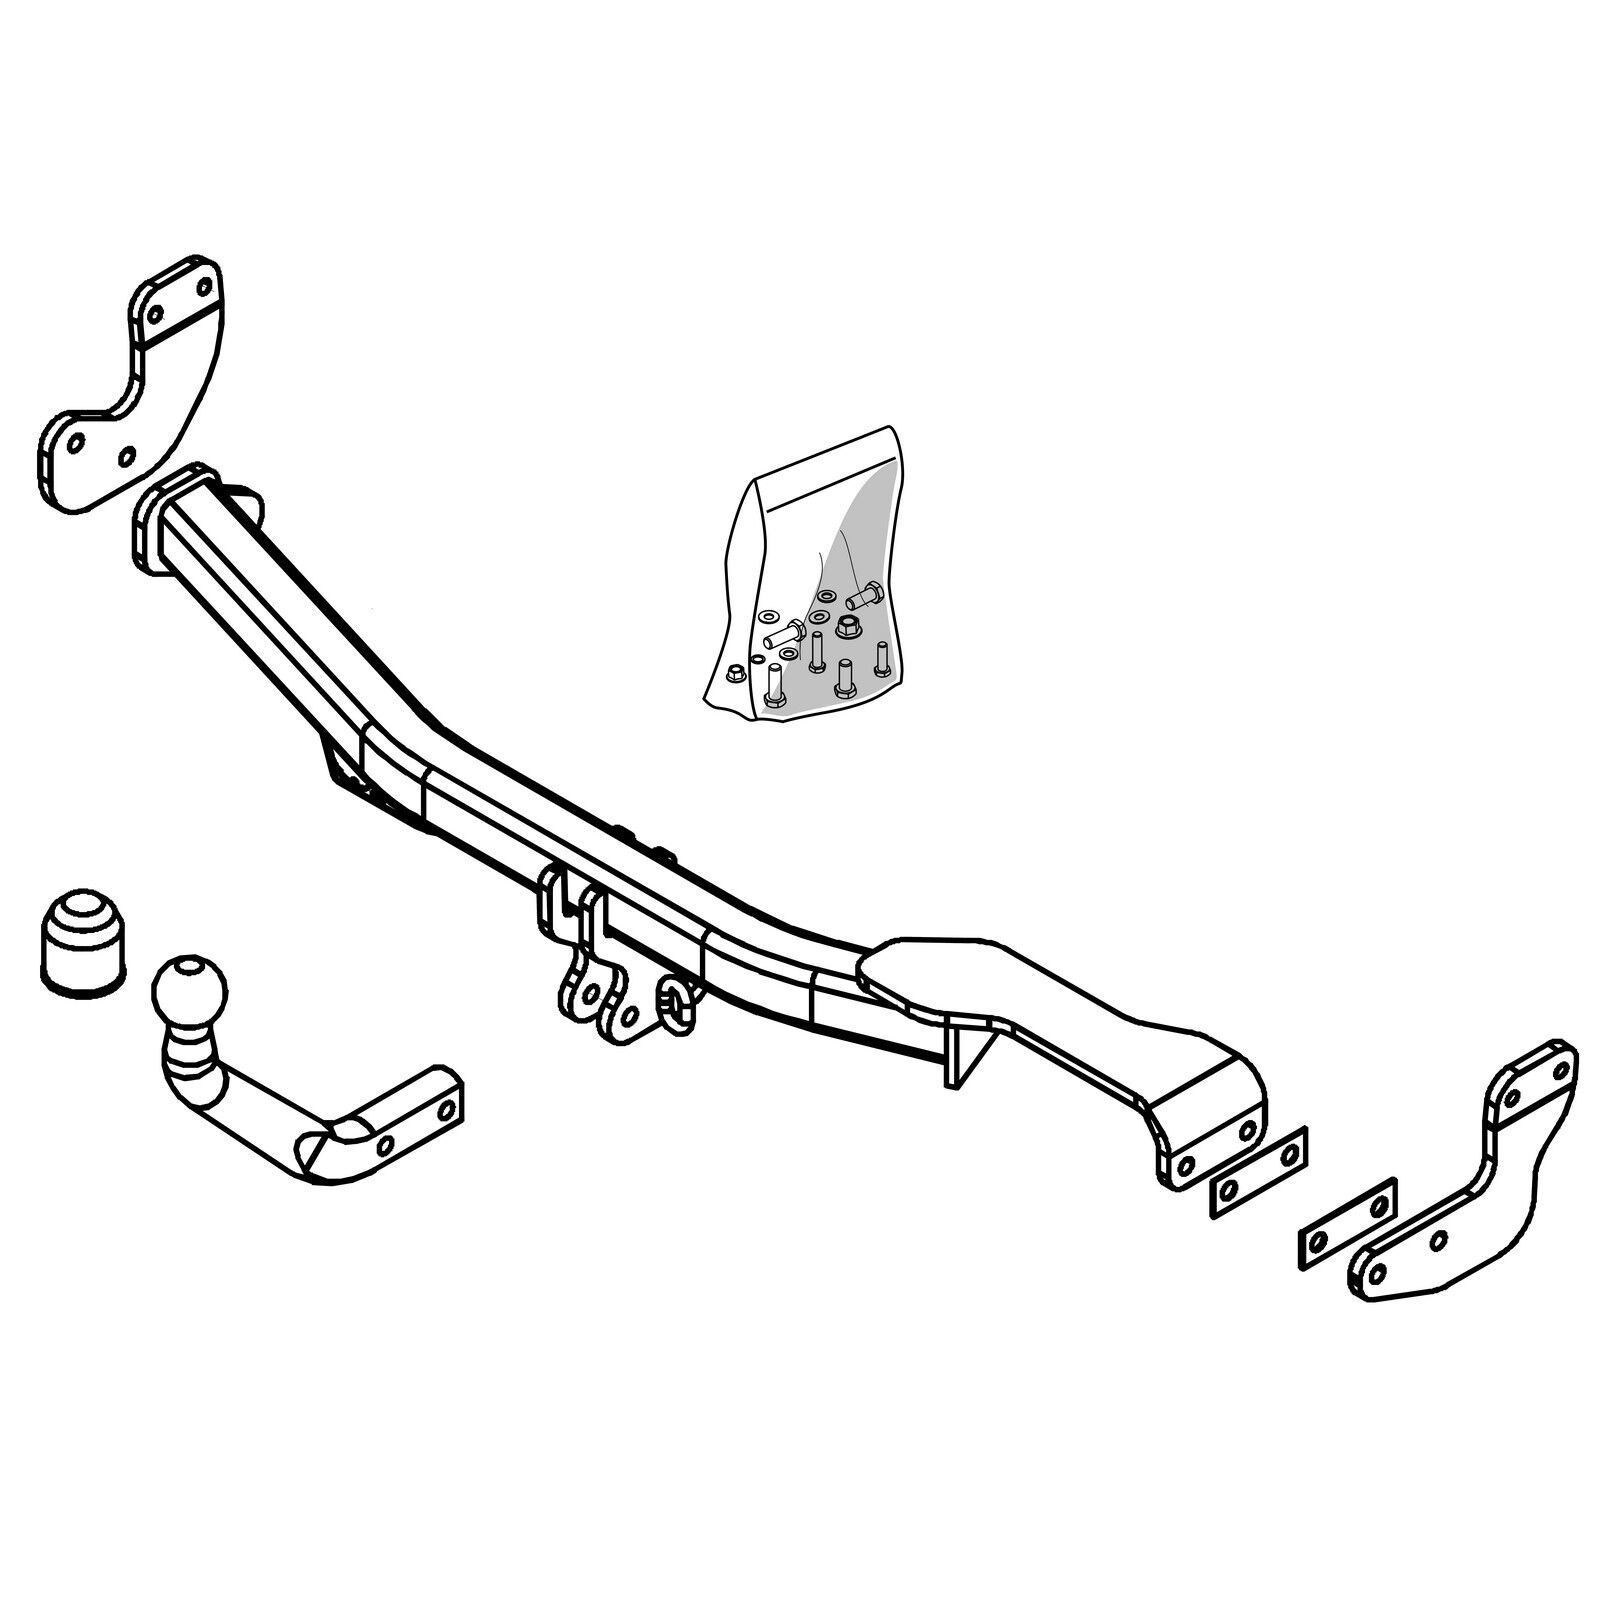 Brink Towbar for Citroen C3 Hatchback 2016 Onwards Swan Neck Tow Bar